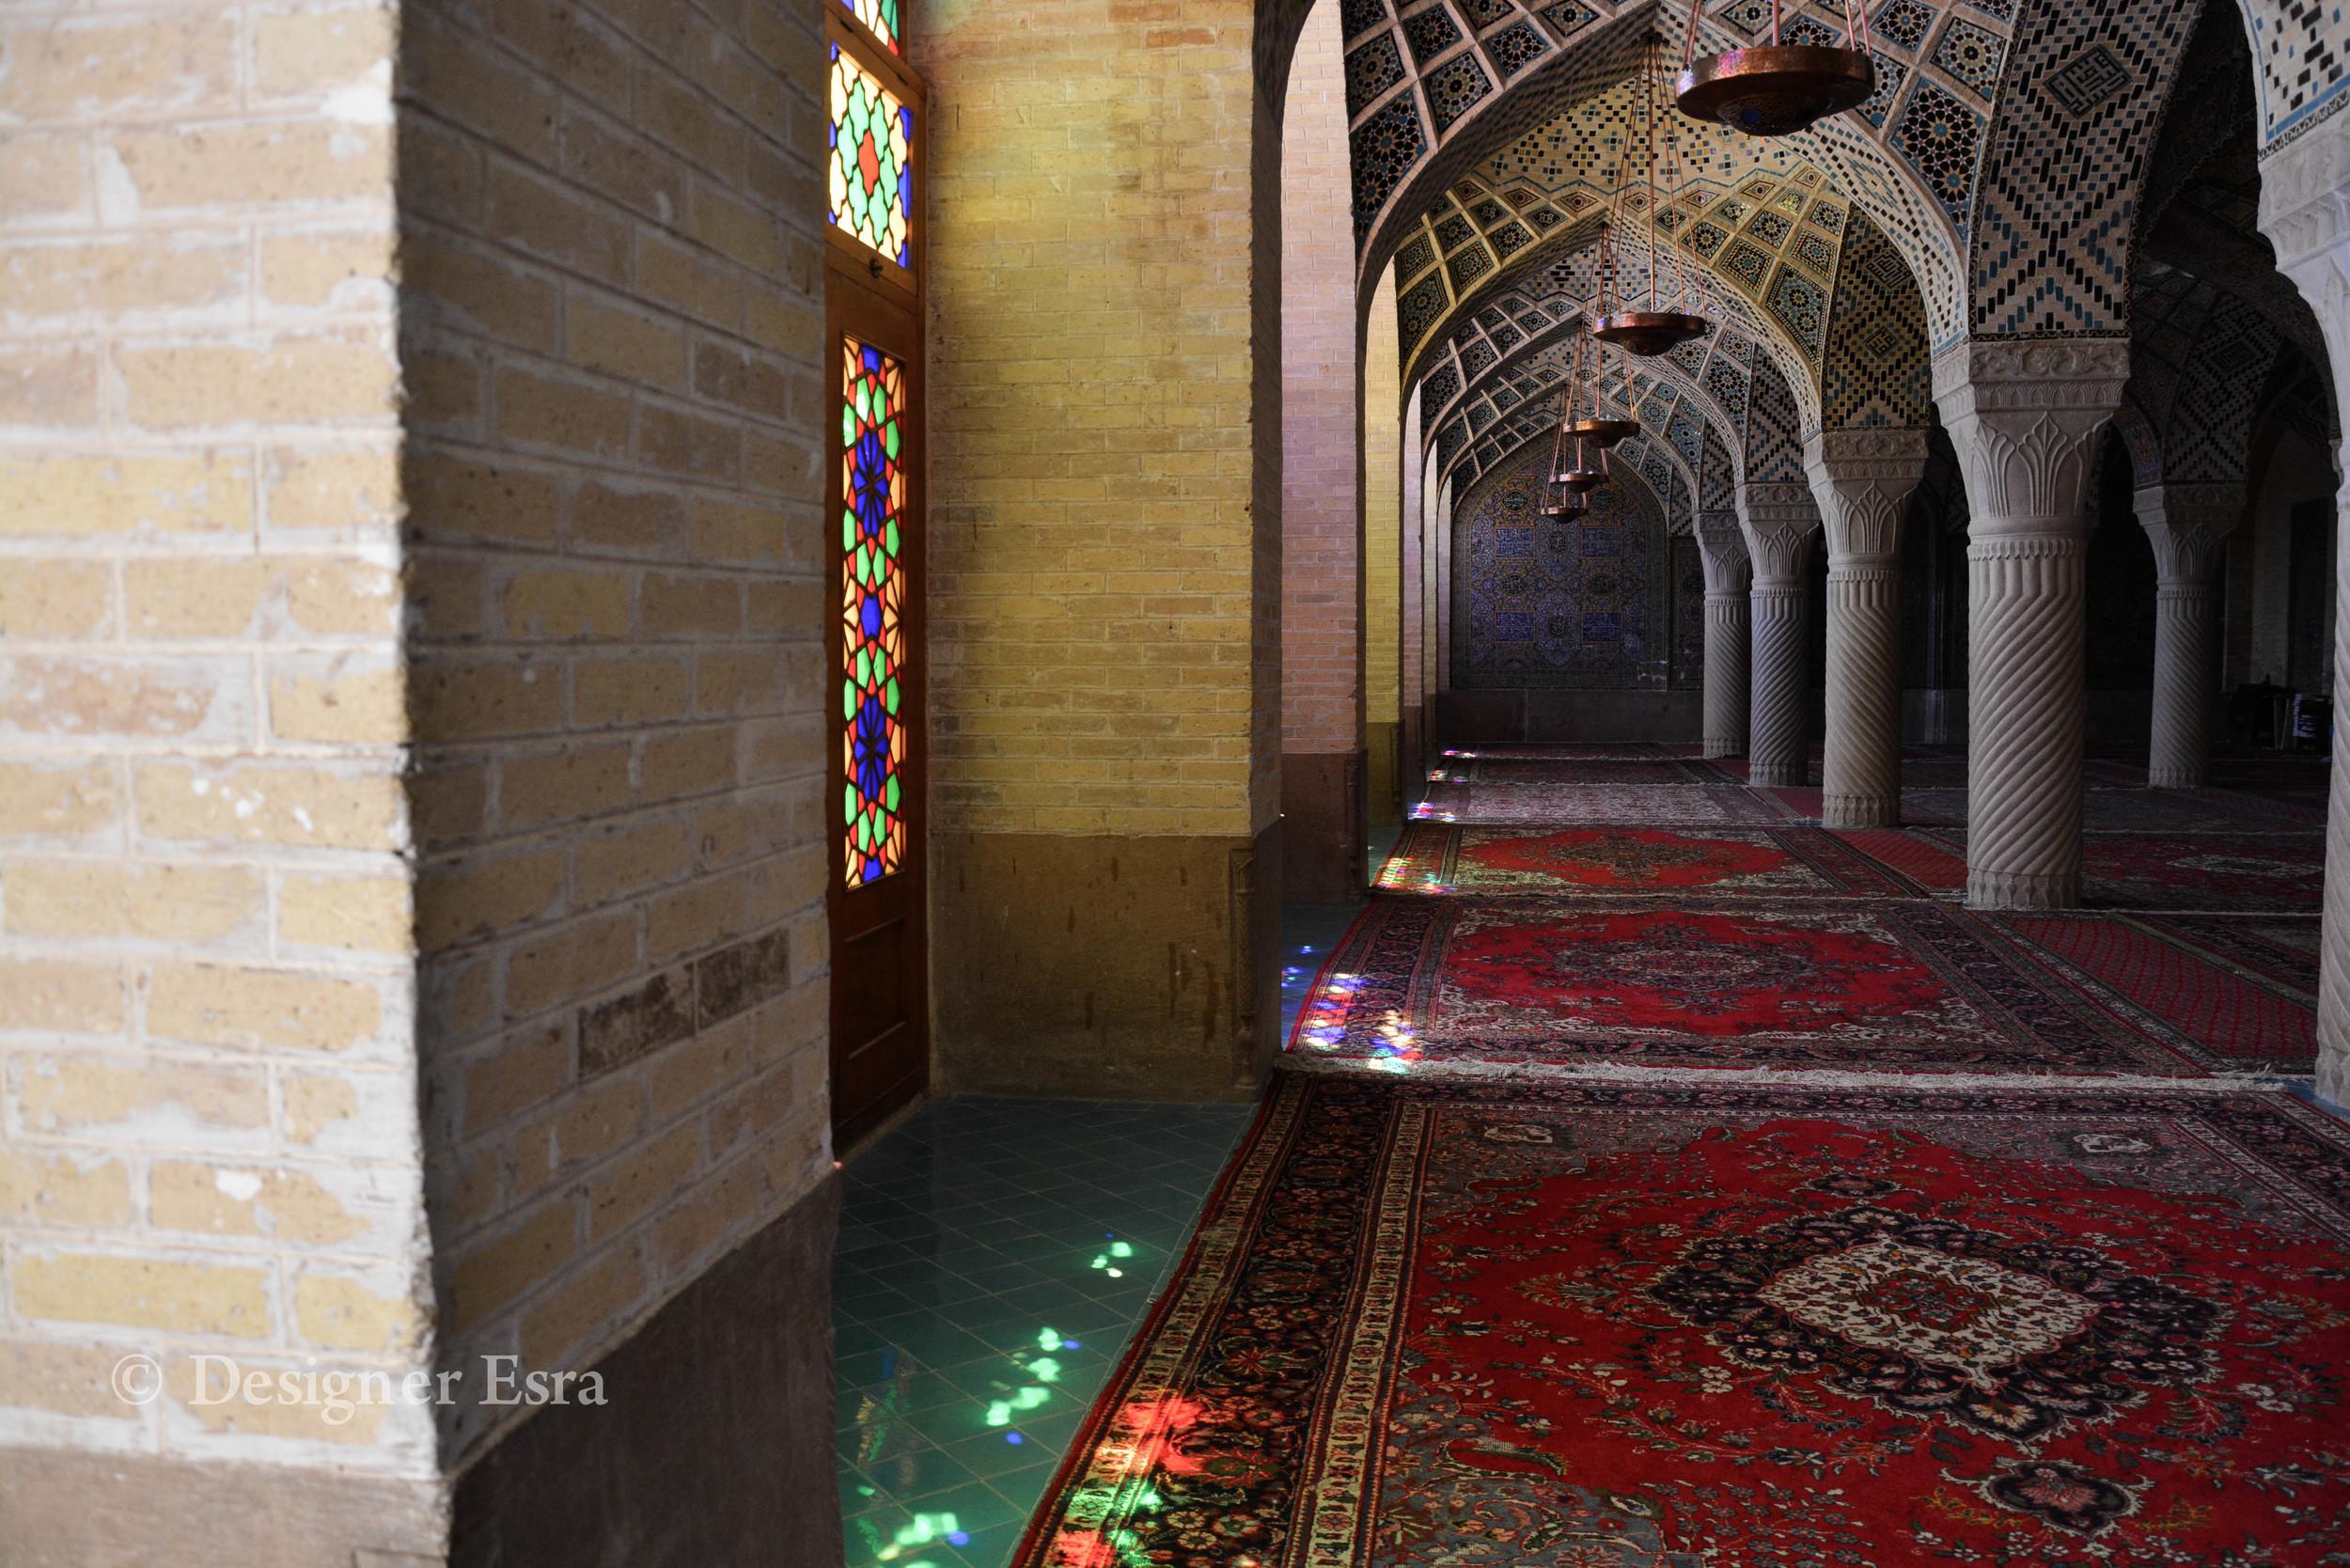 The interior of Nasir Almulk Mosque ( Pink Mosque)